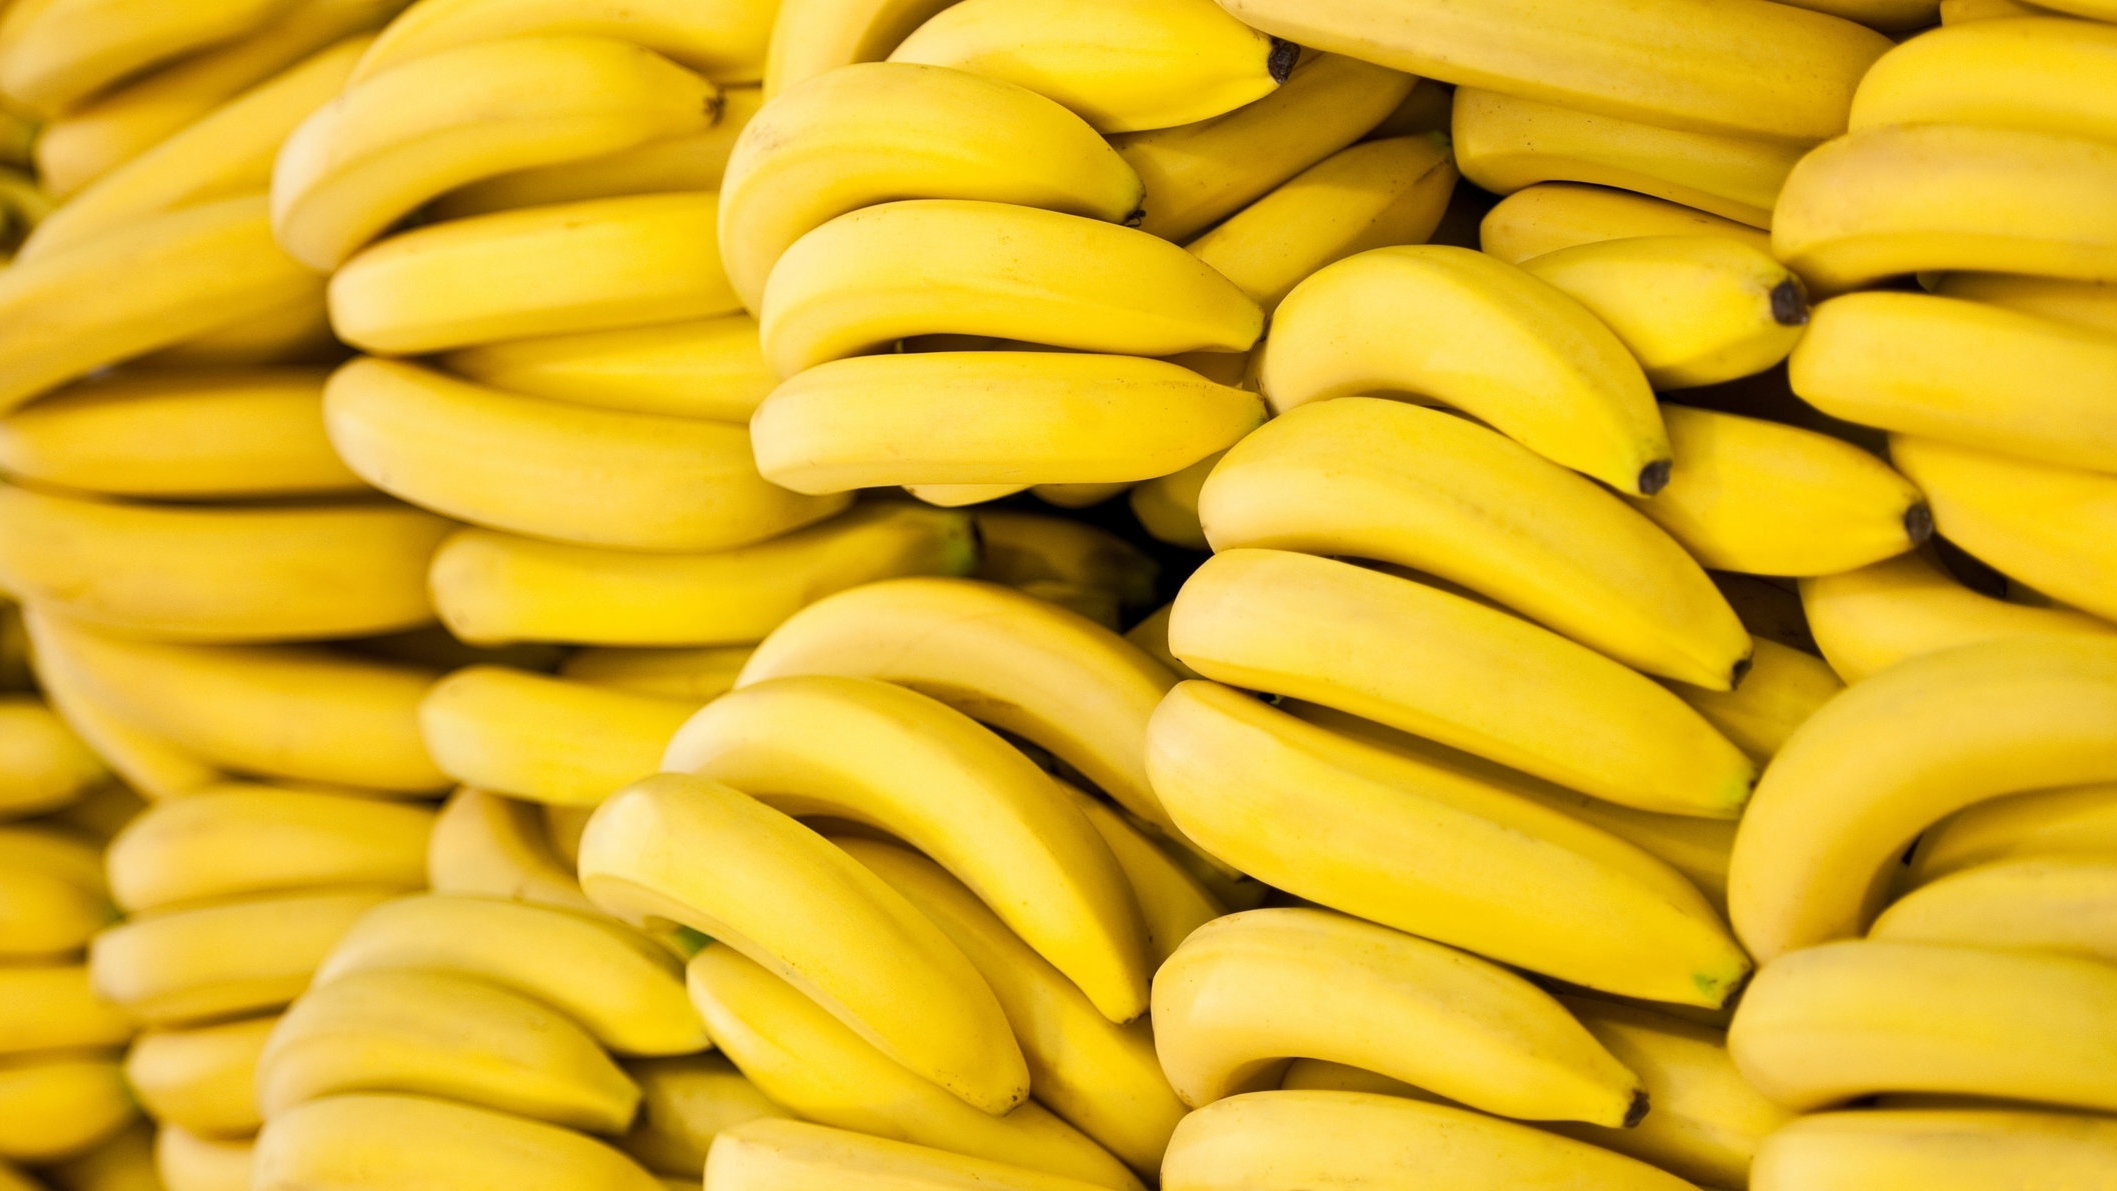 Organic Bananas -